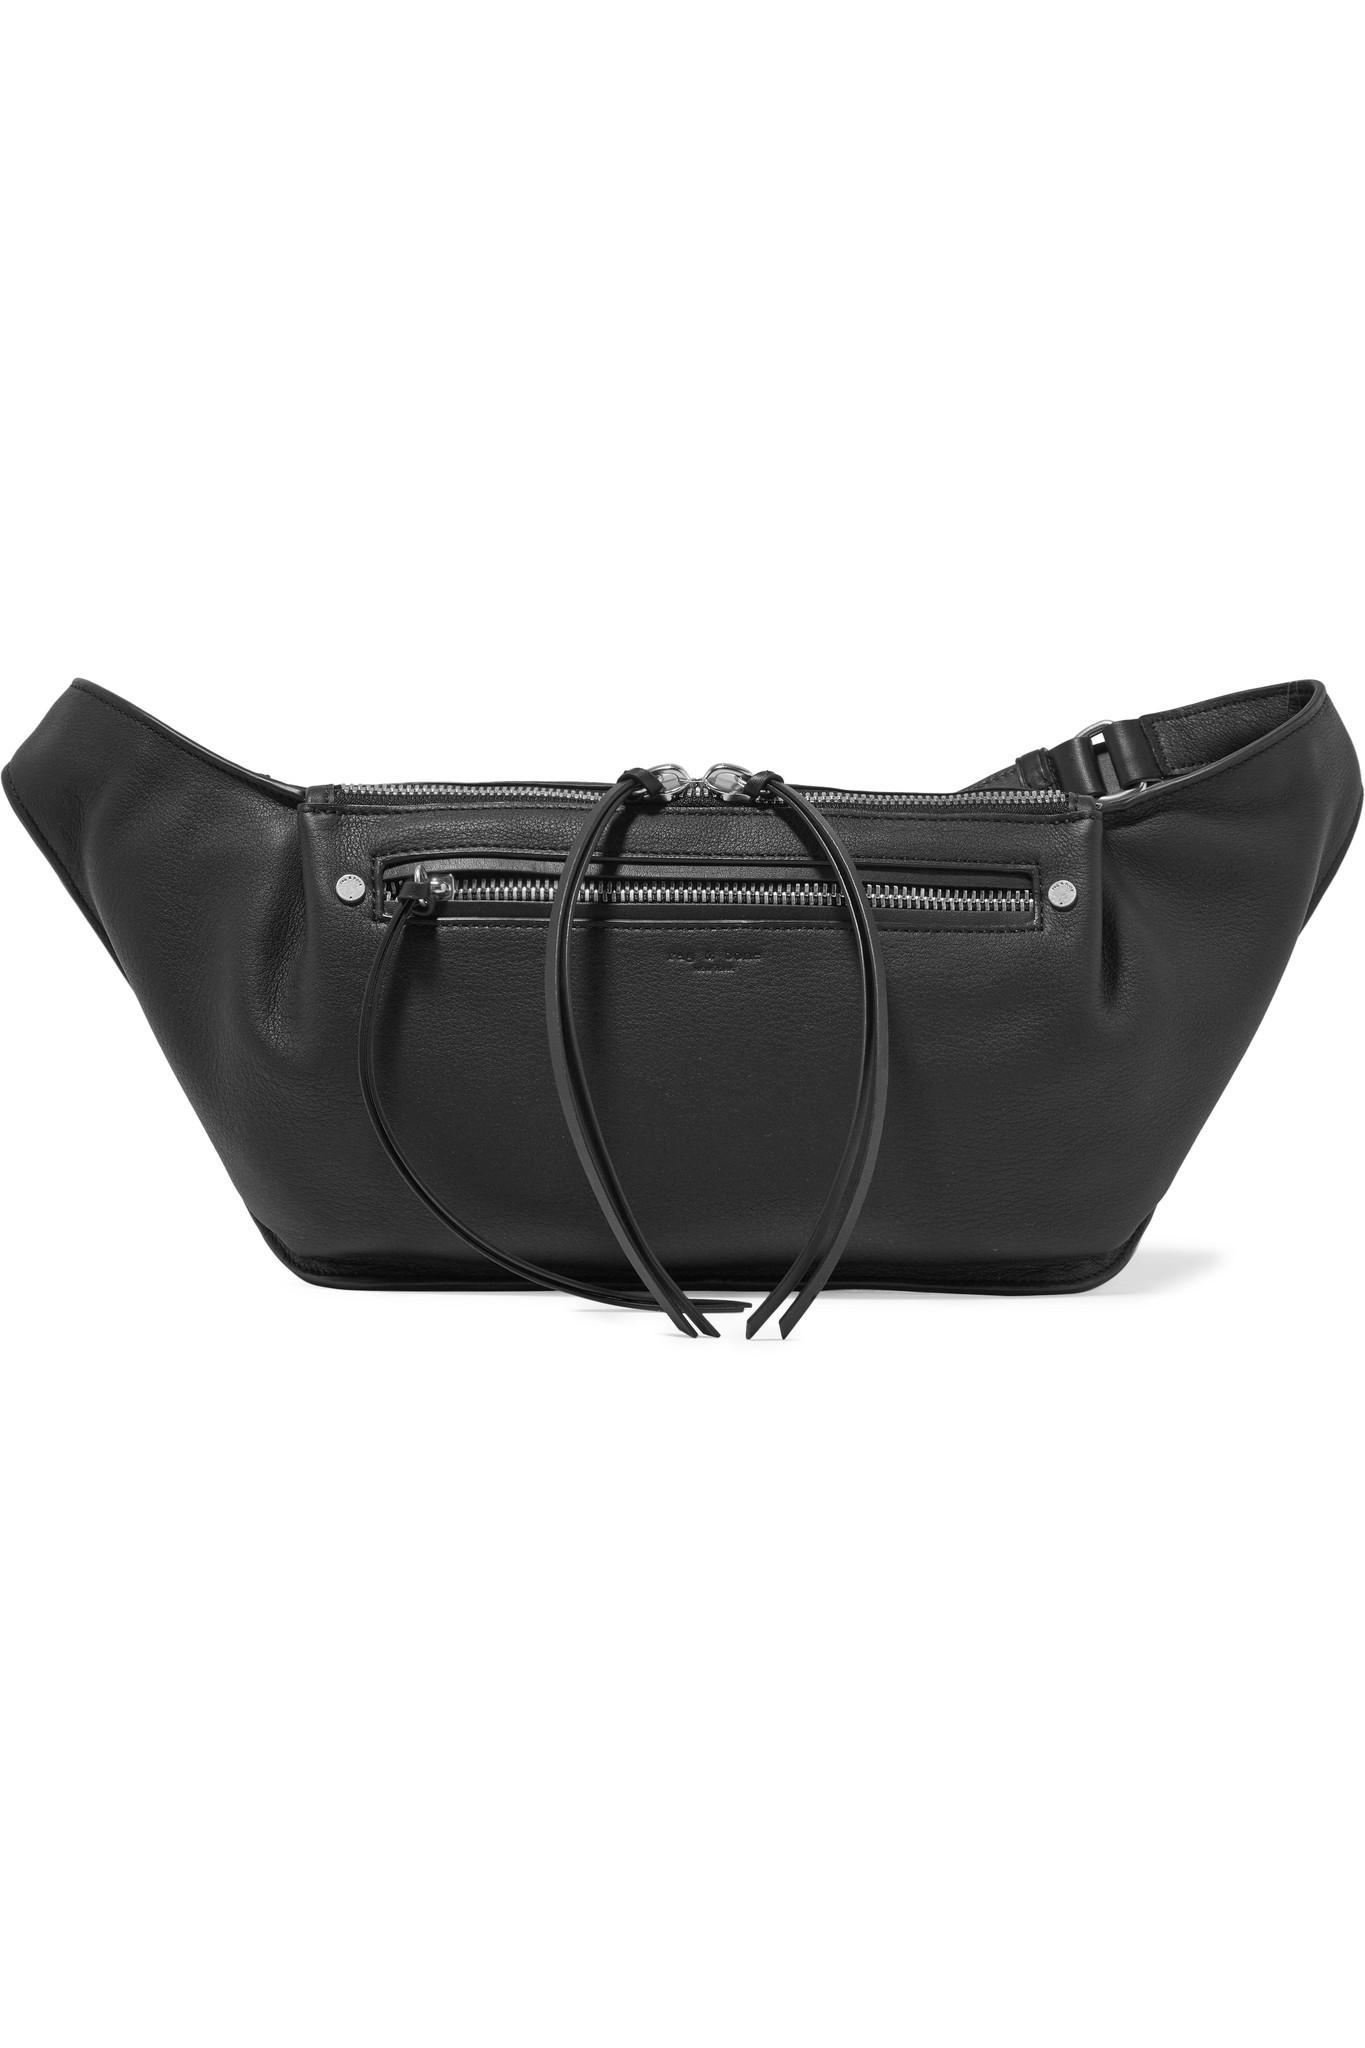 2e9036f17e18 Rag   Bone Ellis Large Textured-leather Belt Bag in Black - Lyst